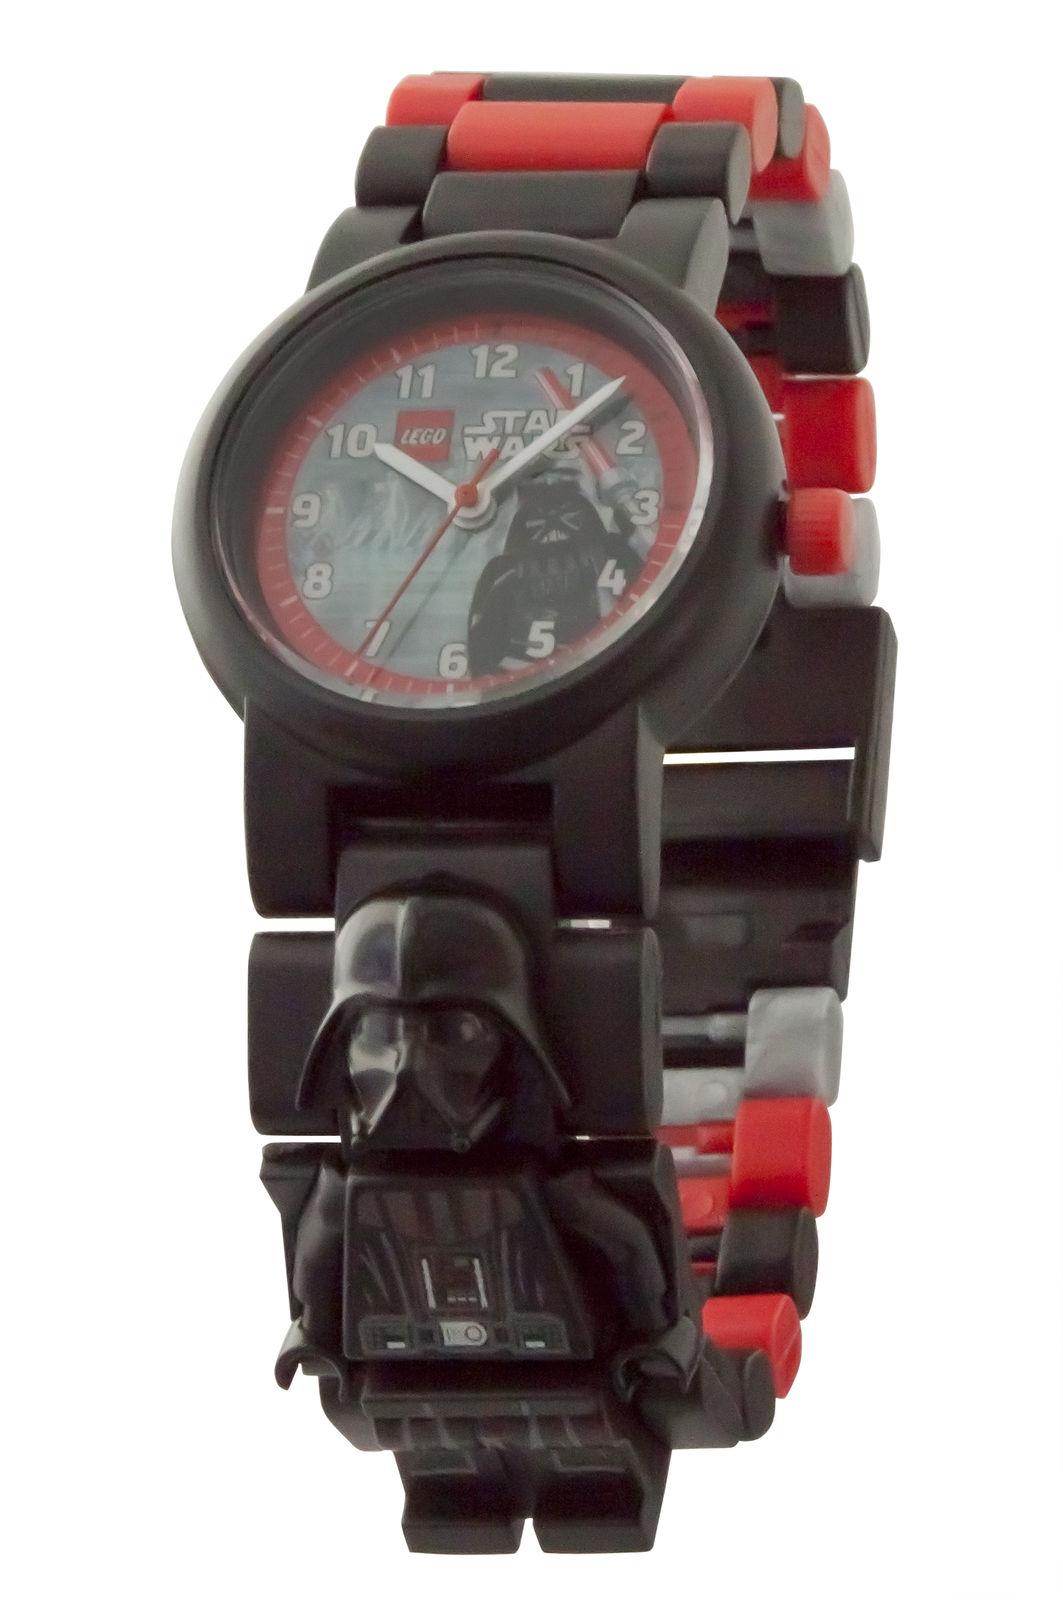 Lego Watches £6.99 @ Aldi (Swansea, Llansamlet)